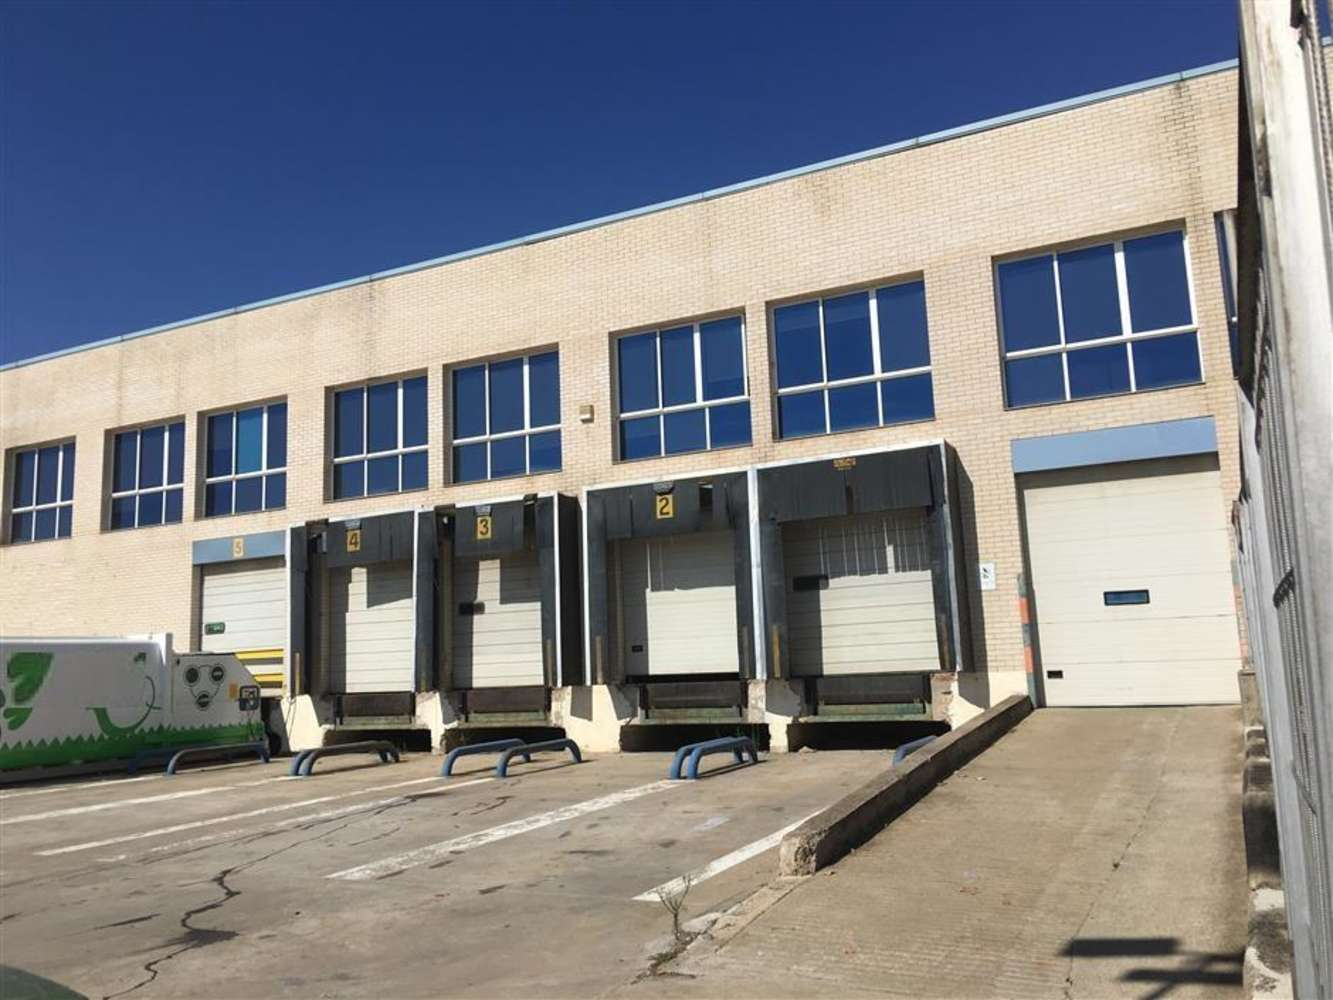 Naves industriales y logísticas Sant fruitós de bages, 08272 - Nave Logística - B0425 - PI SANT ISIDRE - 8726